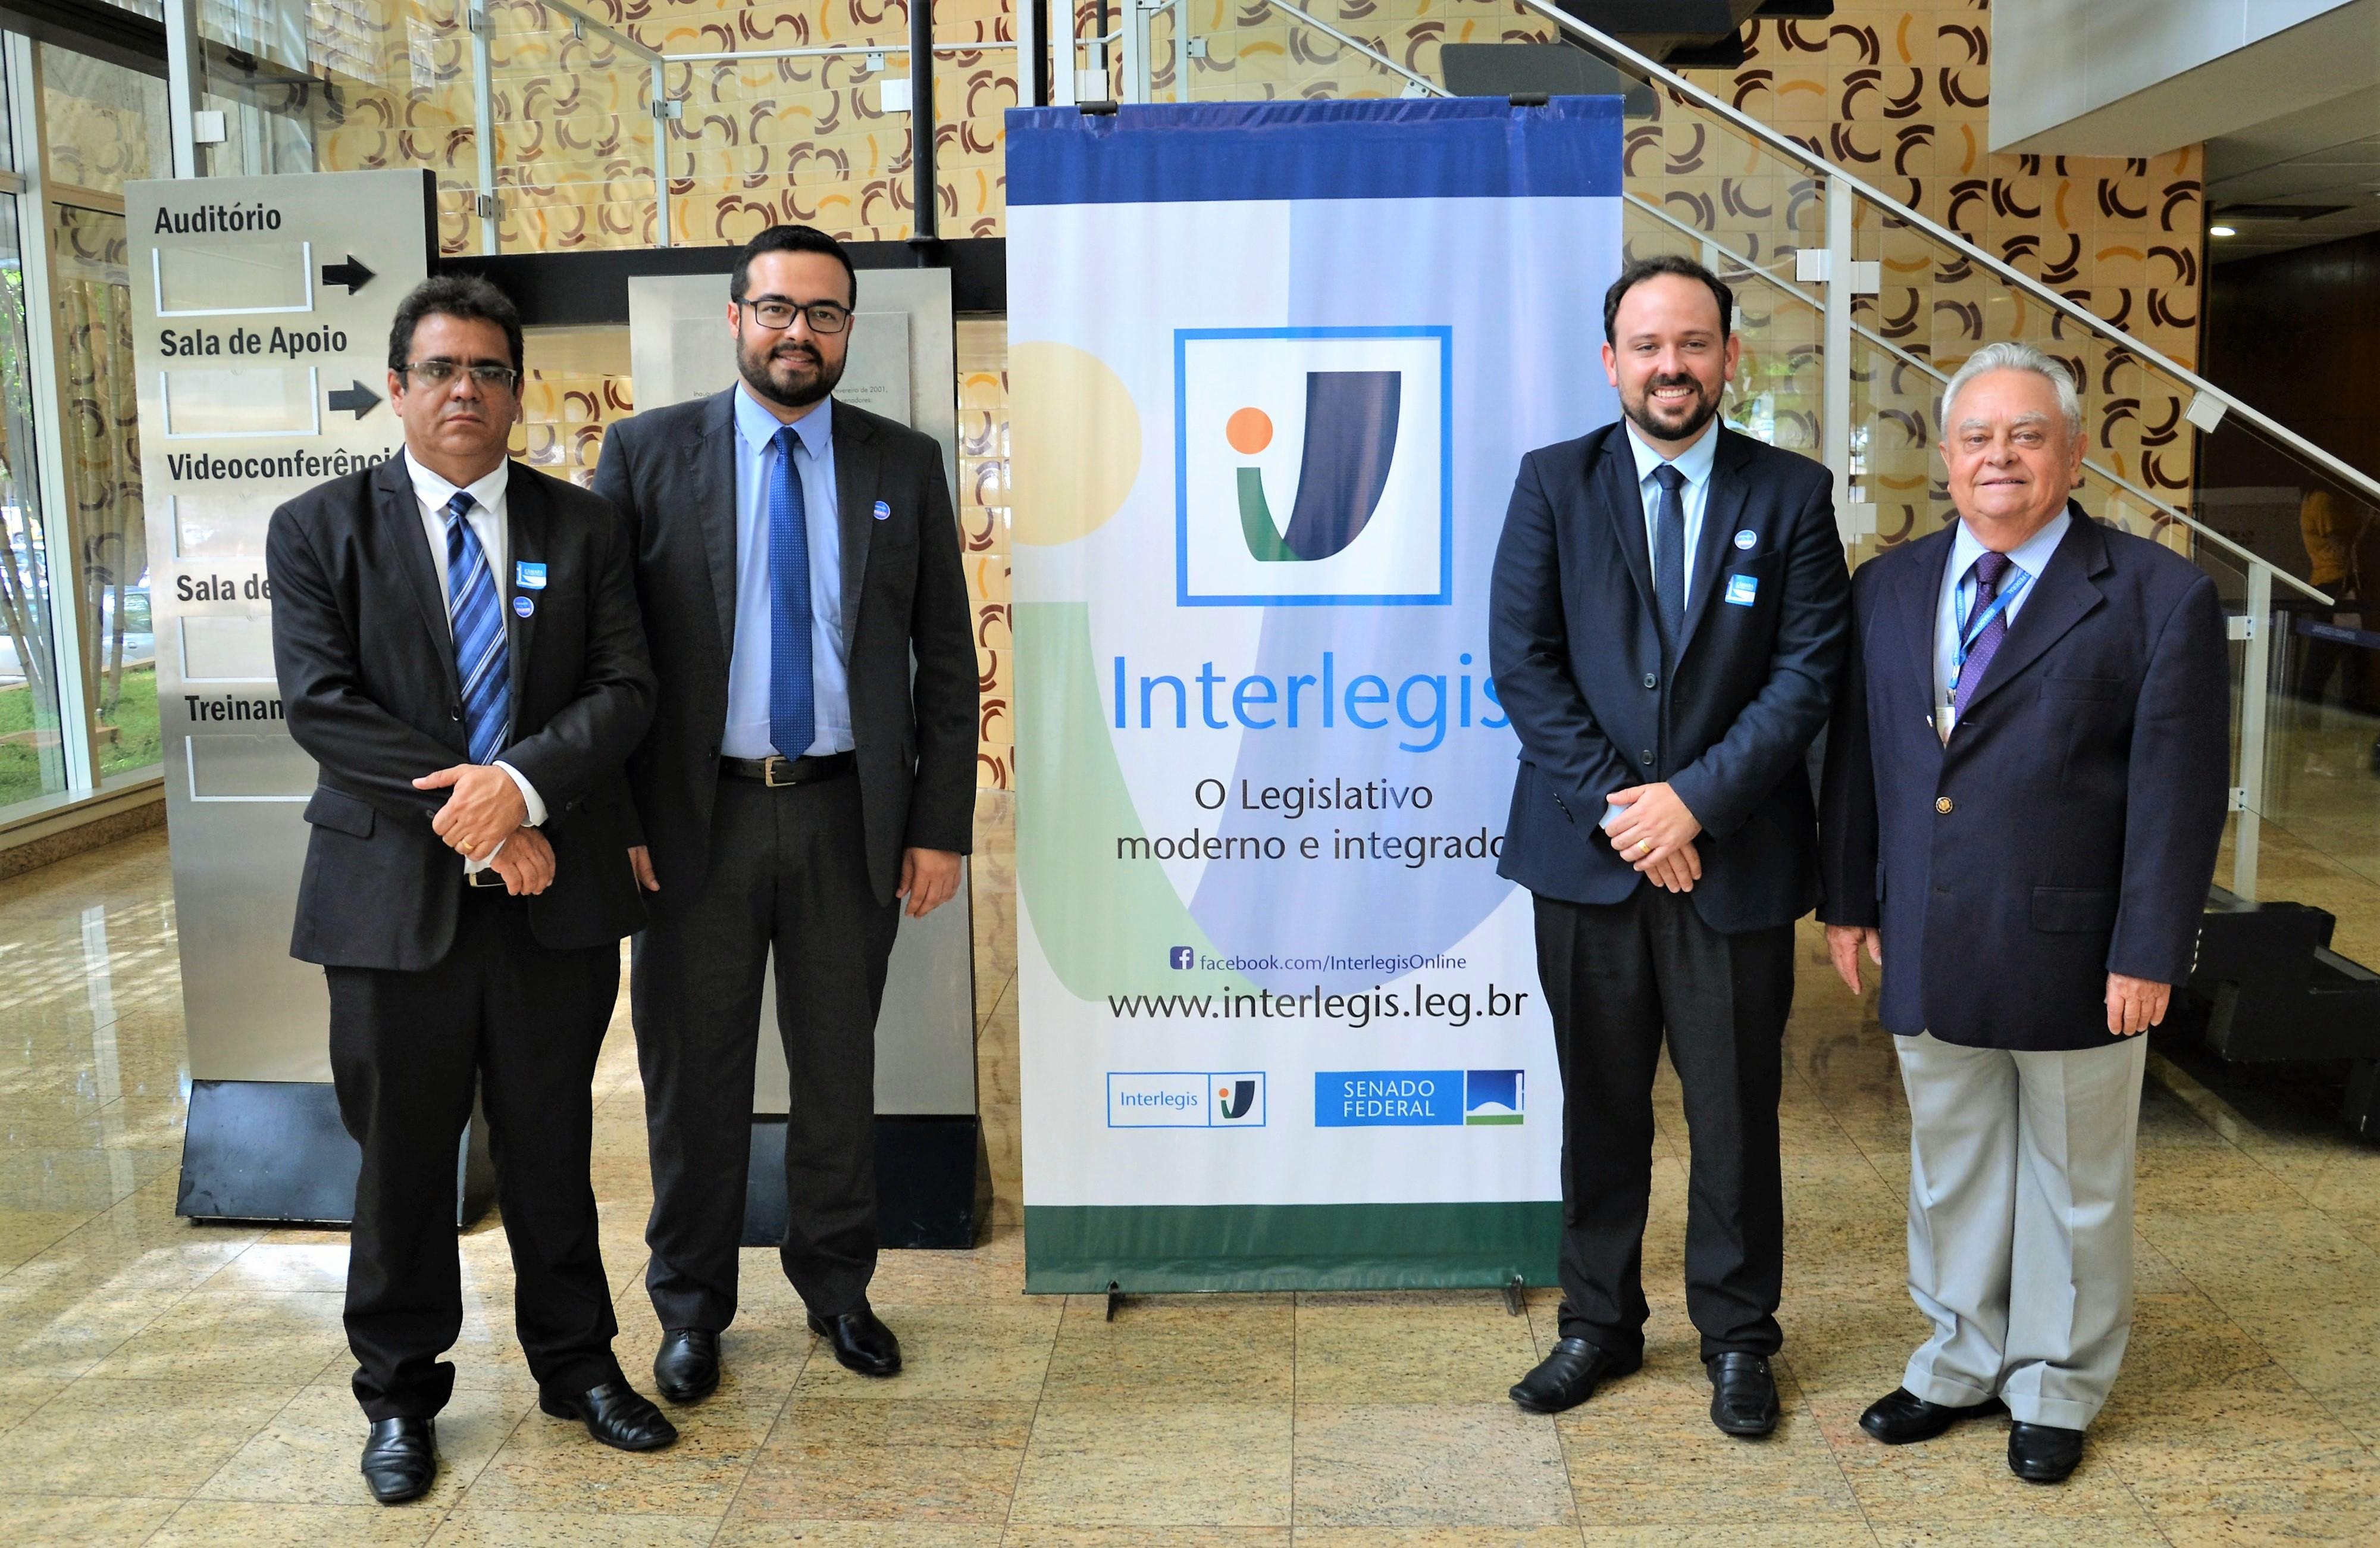 Vereadores de Salgueiro (PE) visitam o Interlegis